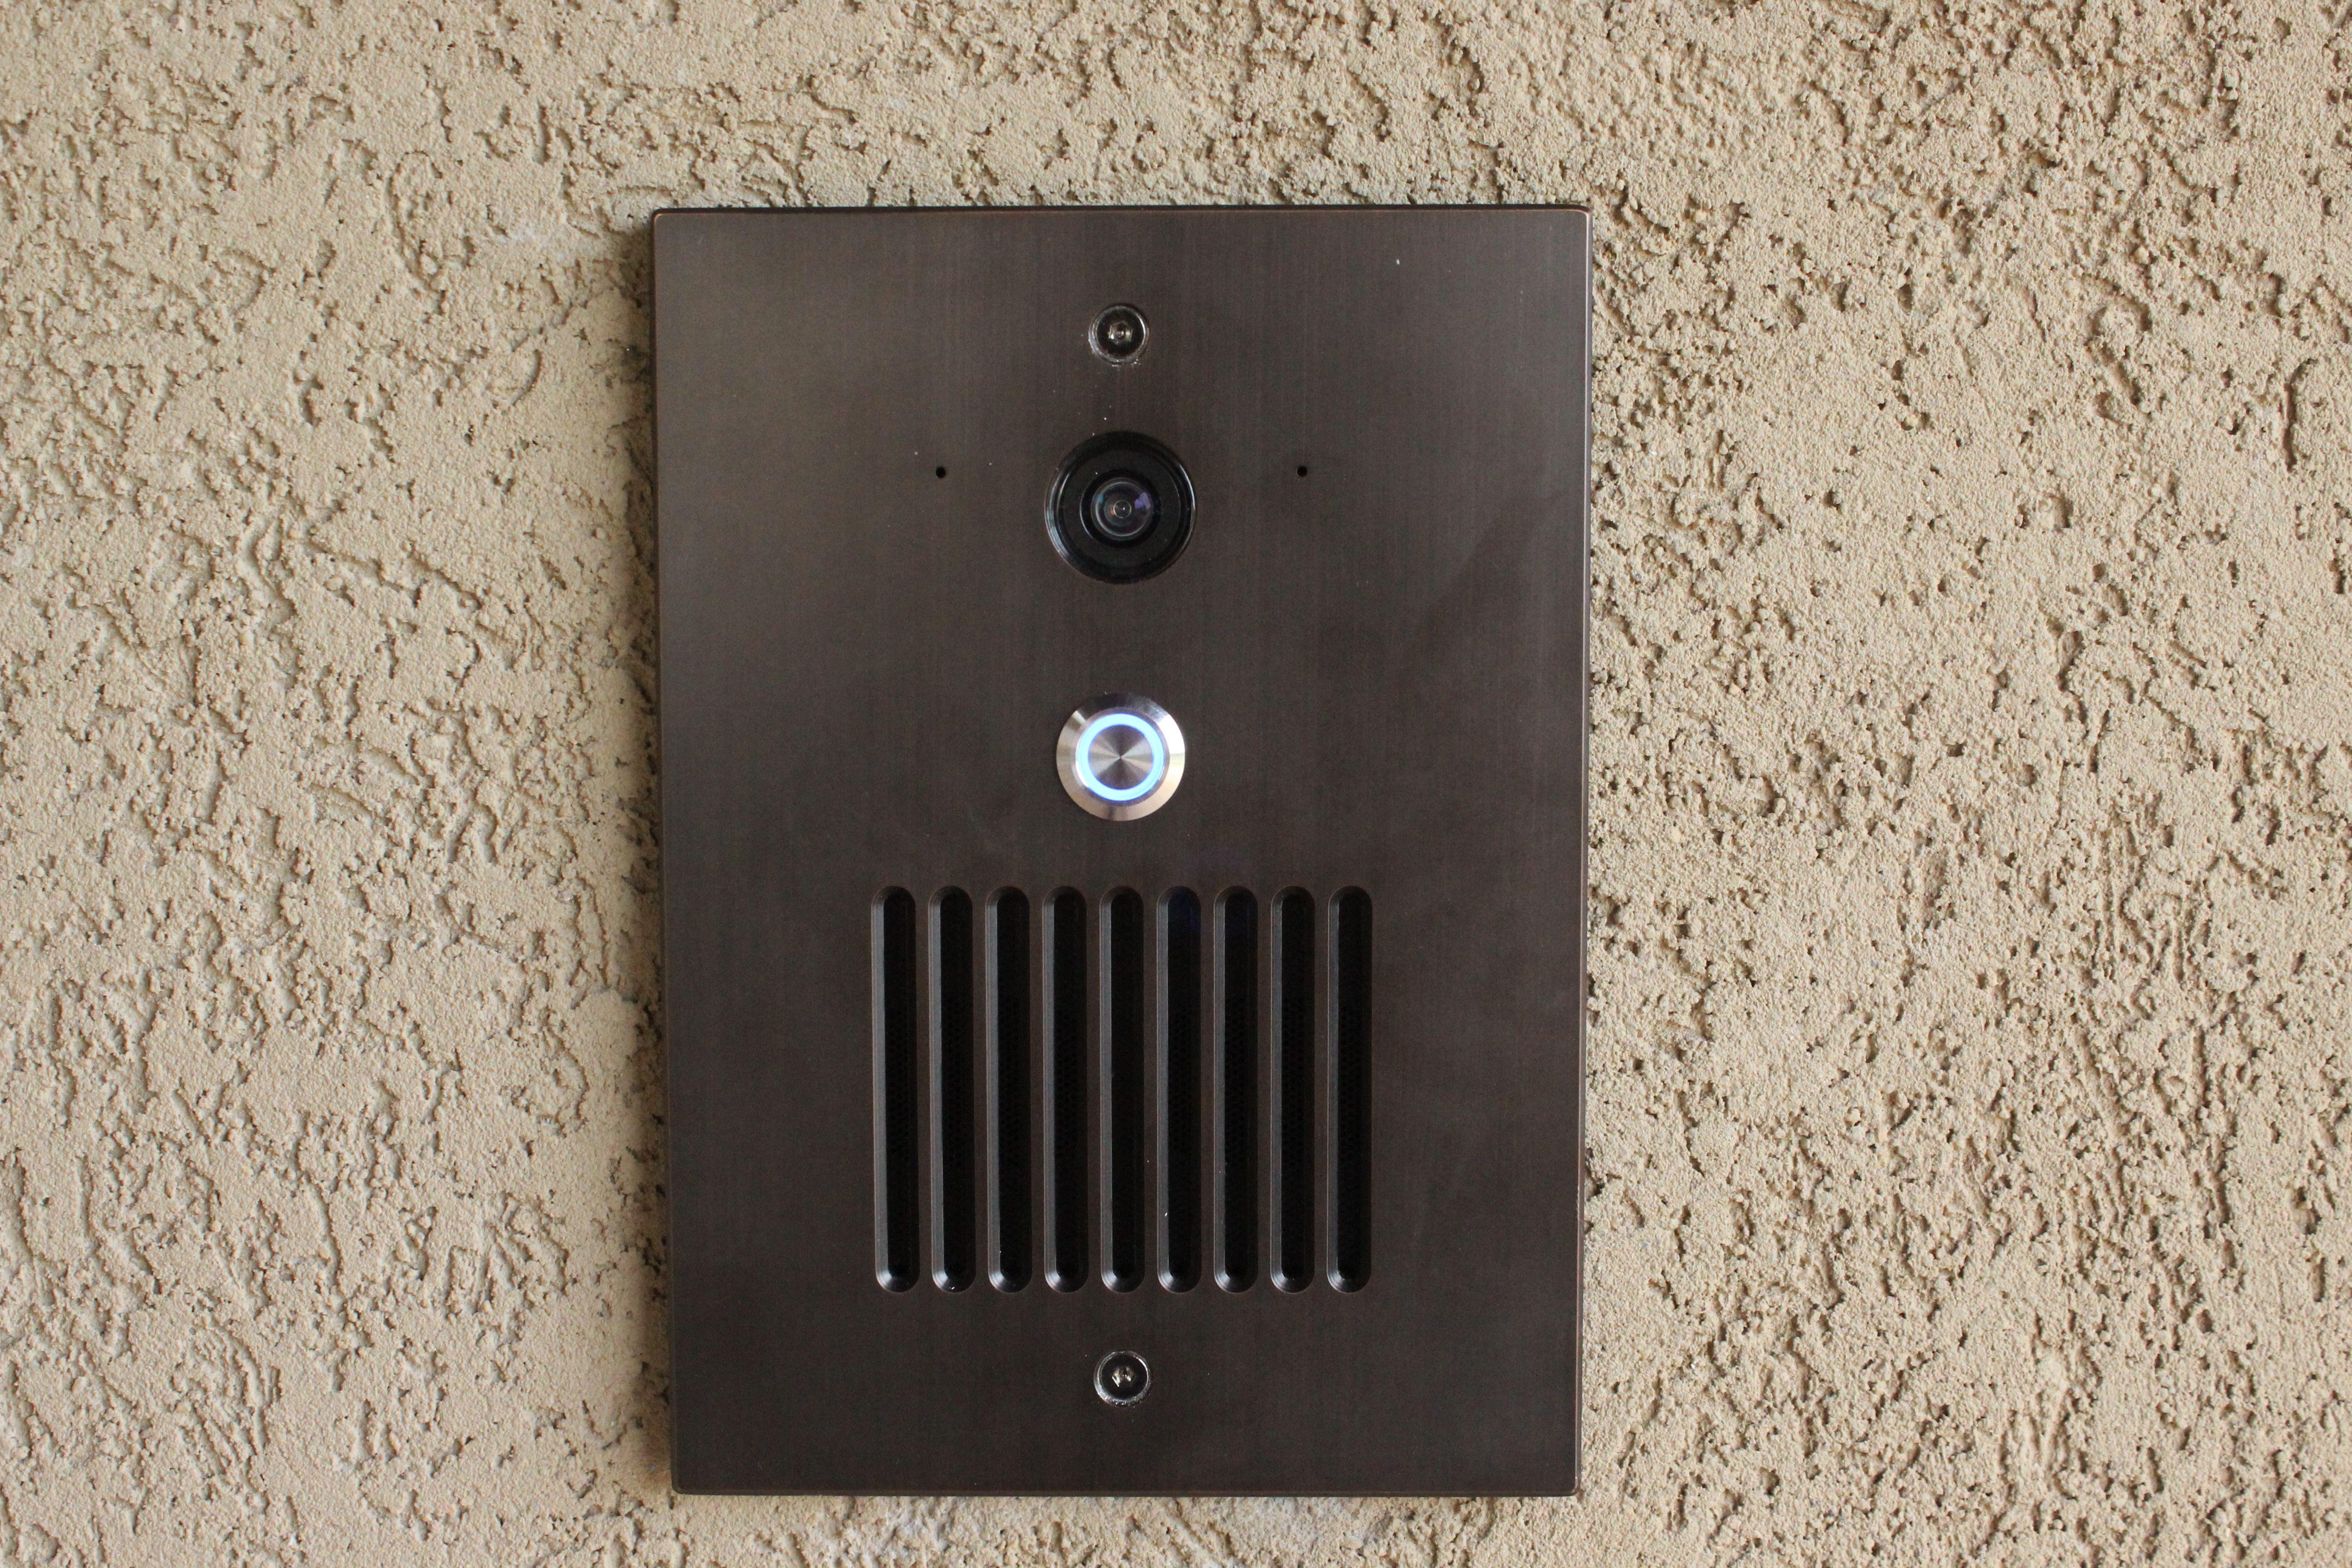 Control4 doorbell with camera and intercom built in makes control4 doorbell with camera and intercom built in makes answering the door as easy rubansaba